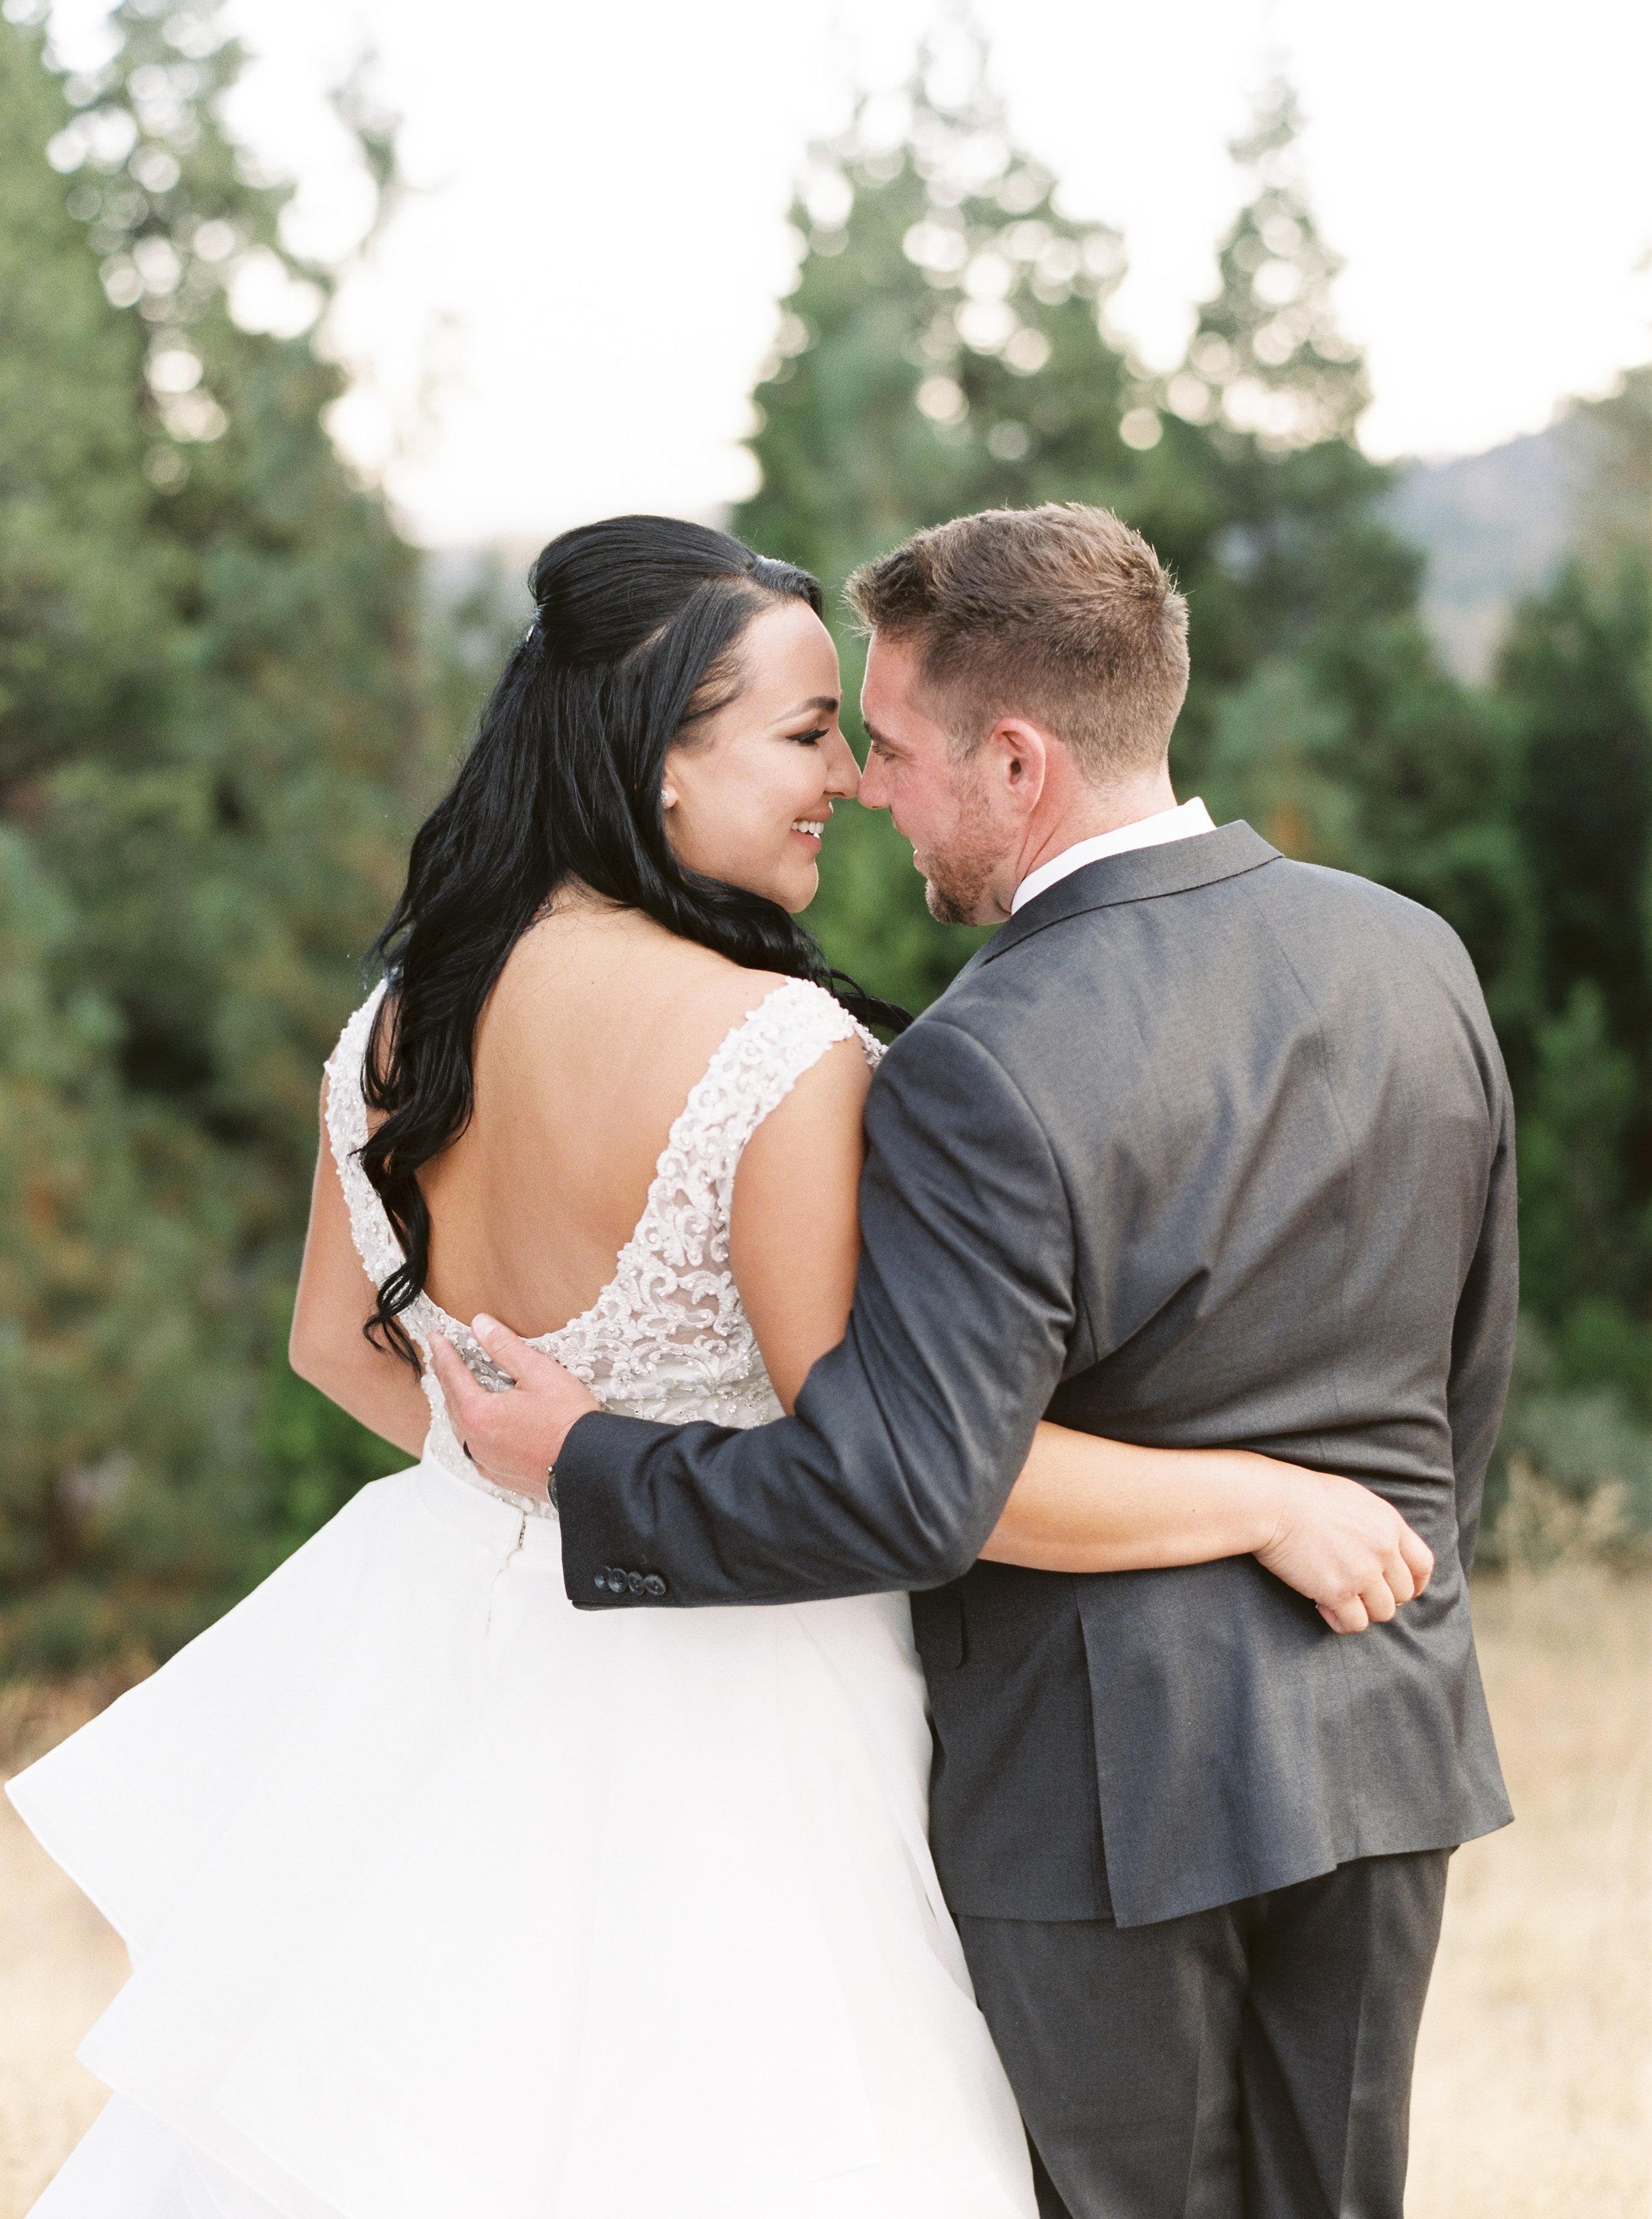 Tenaya-lodge-wedding-at-yosemite-national-park-california-57.jpg